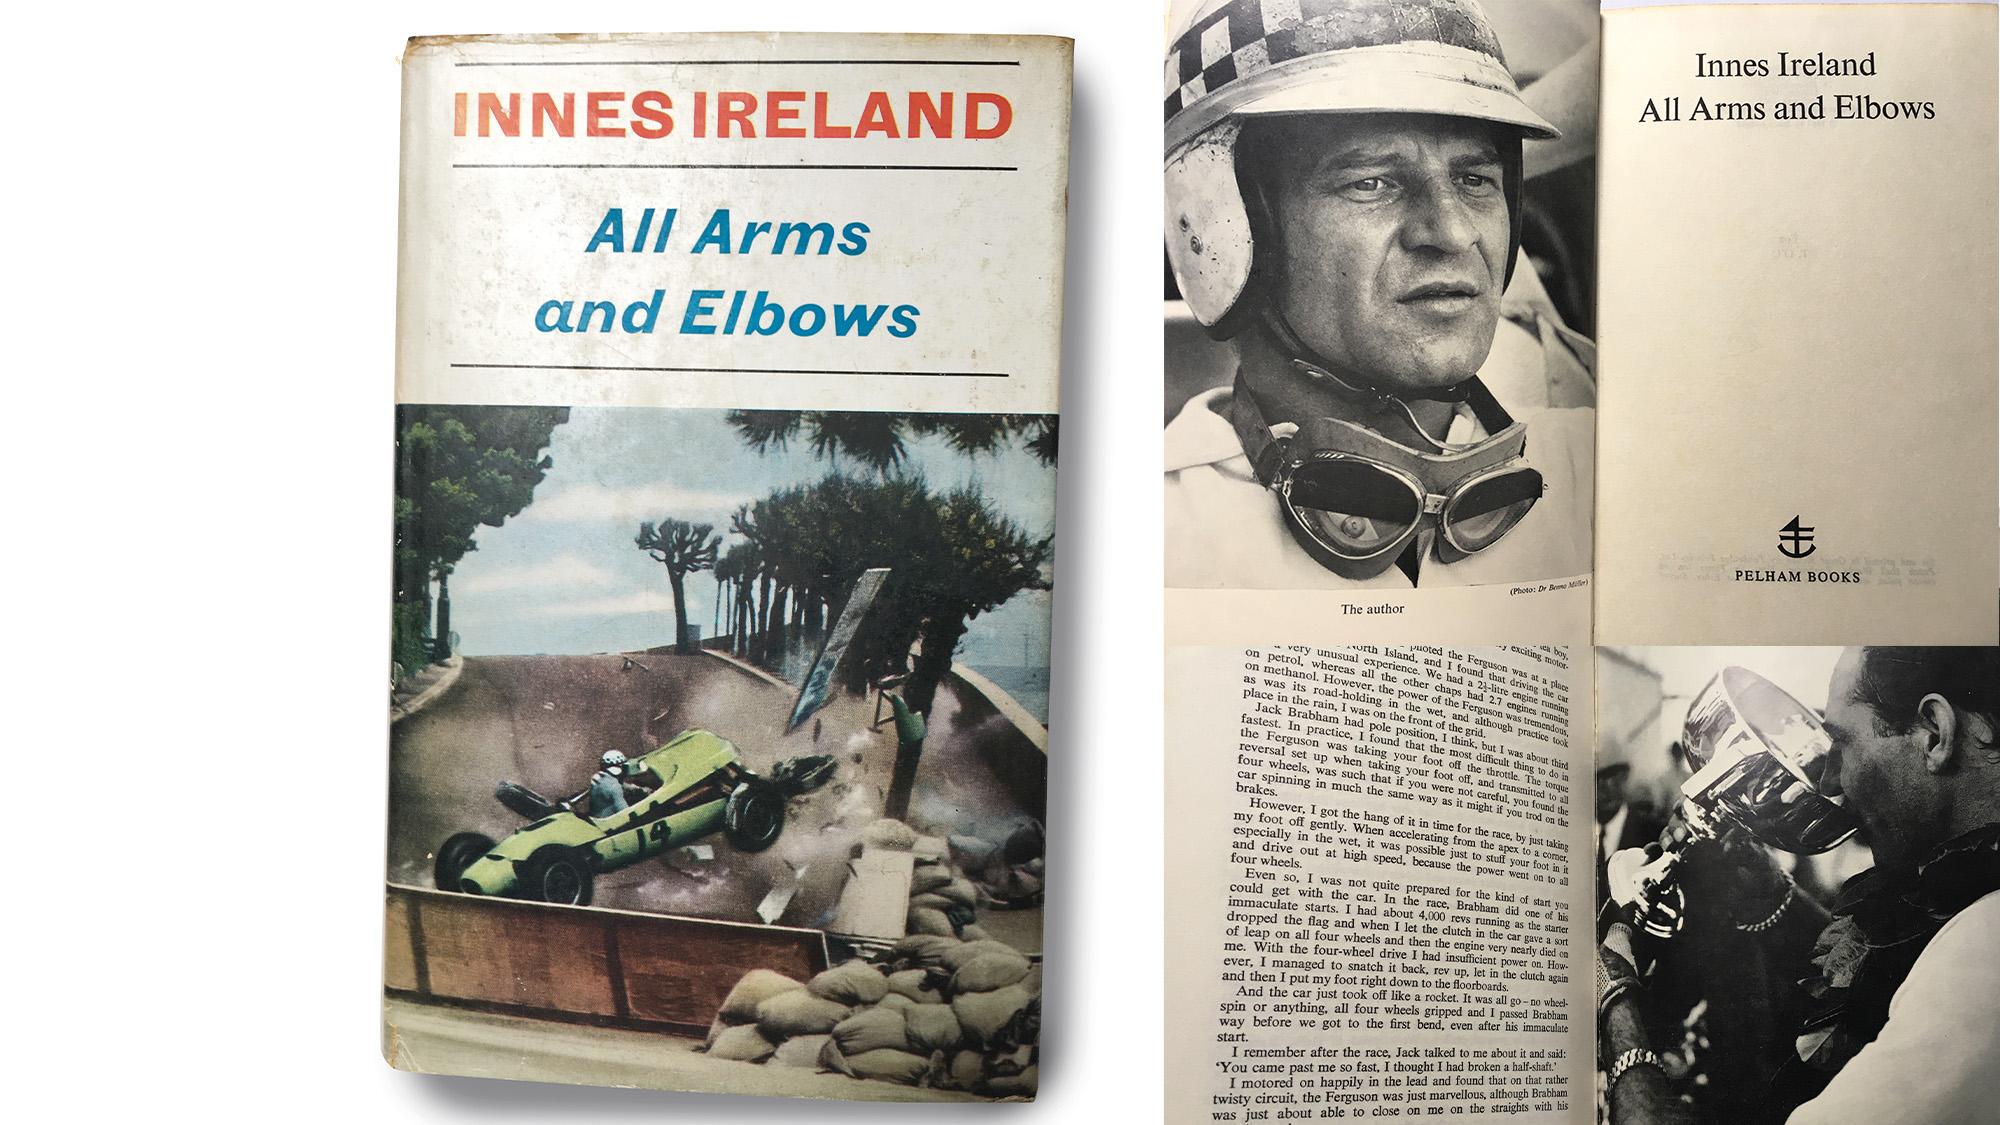 Innes Ireland book